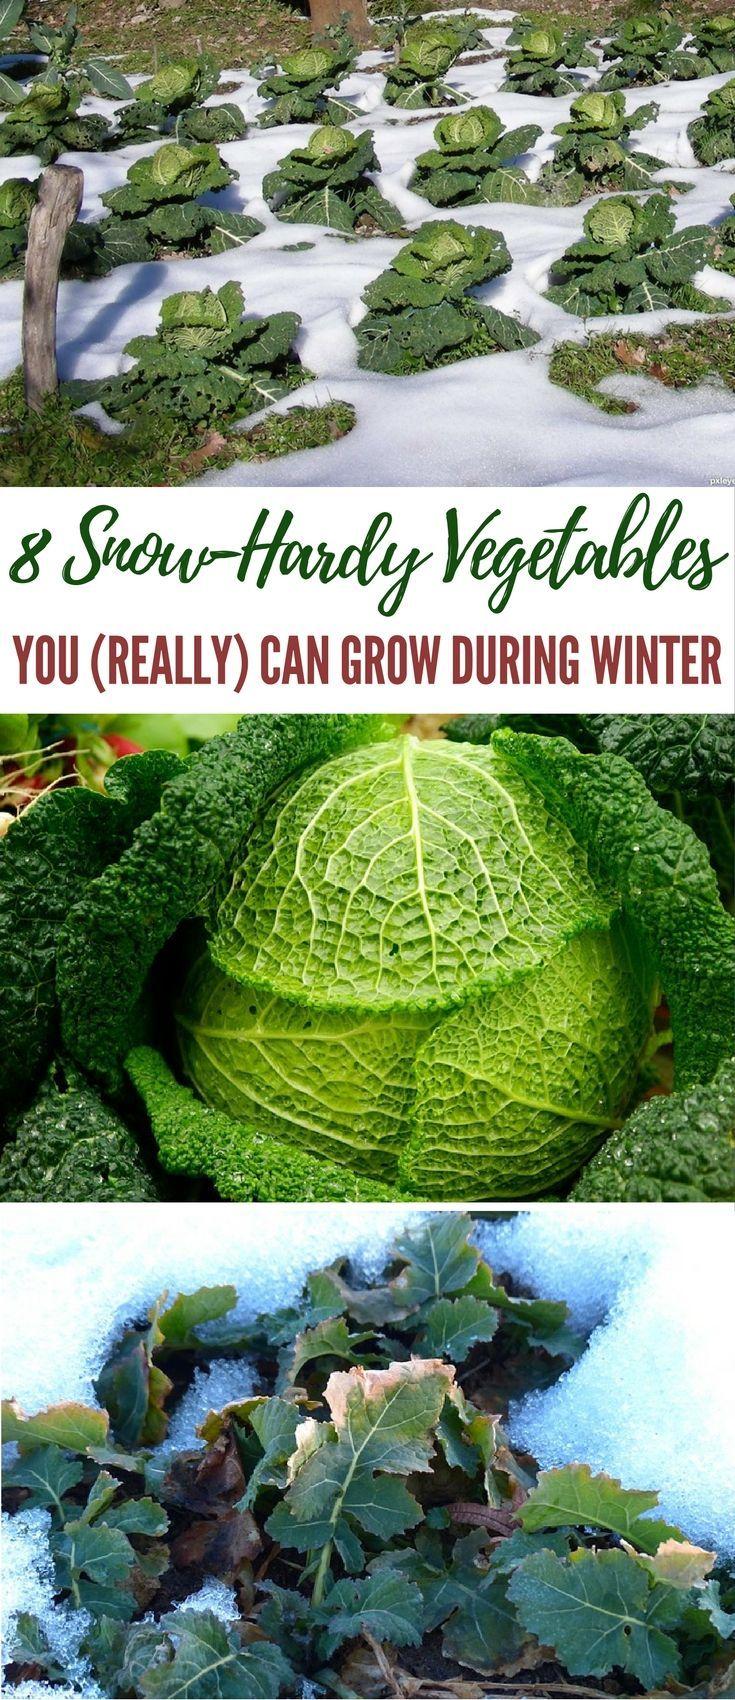 25 best ideas about winter garden on pinterest - Prepare vegetable garden for winter ...